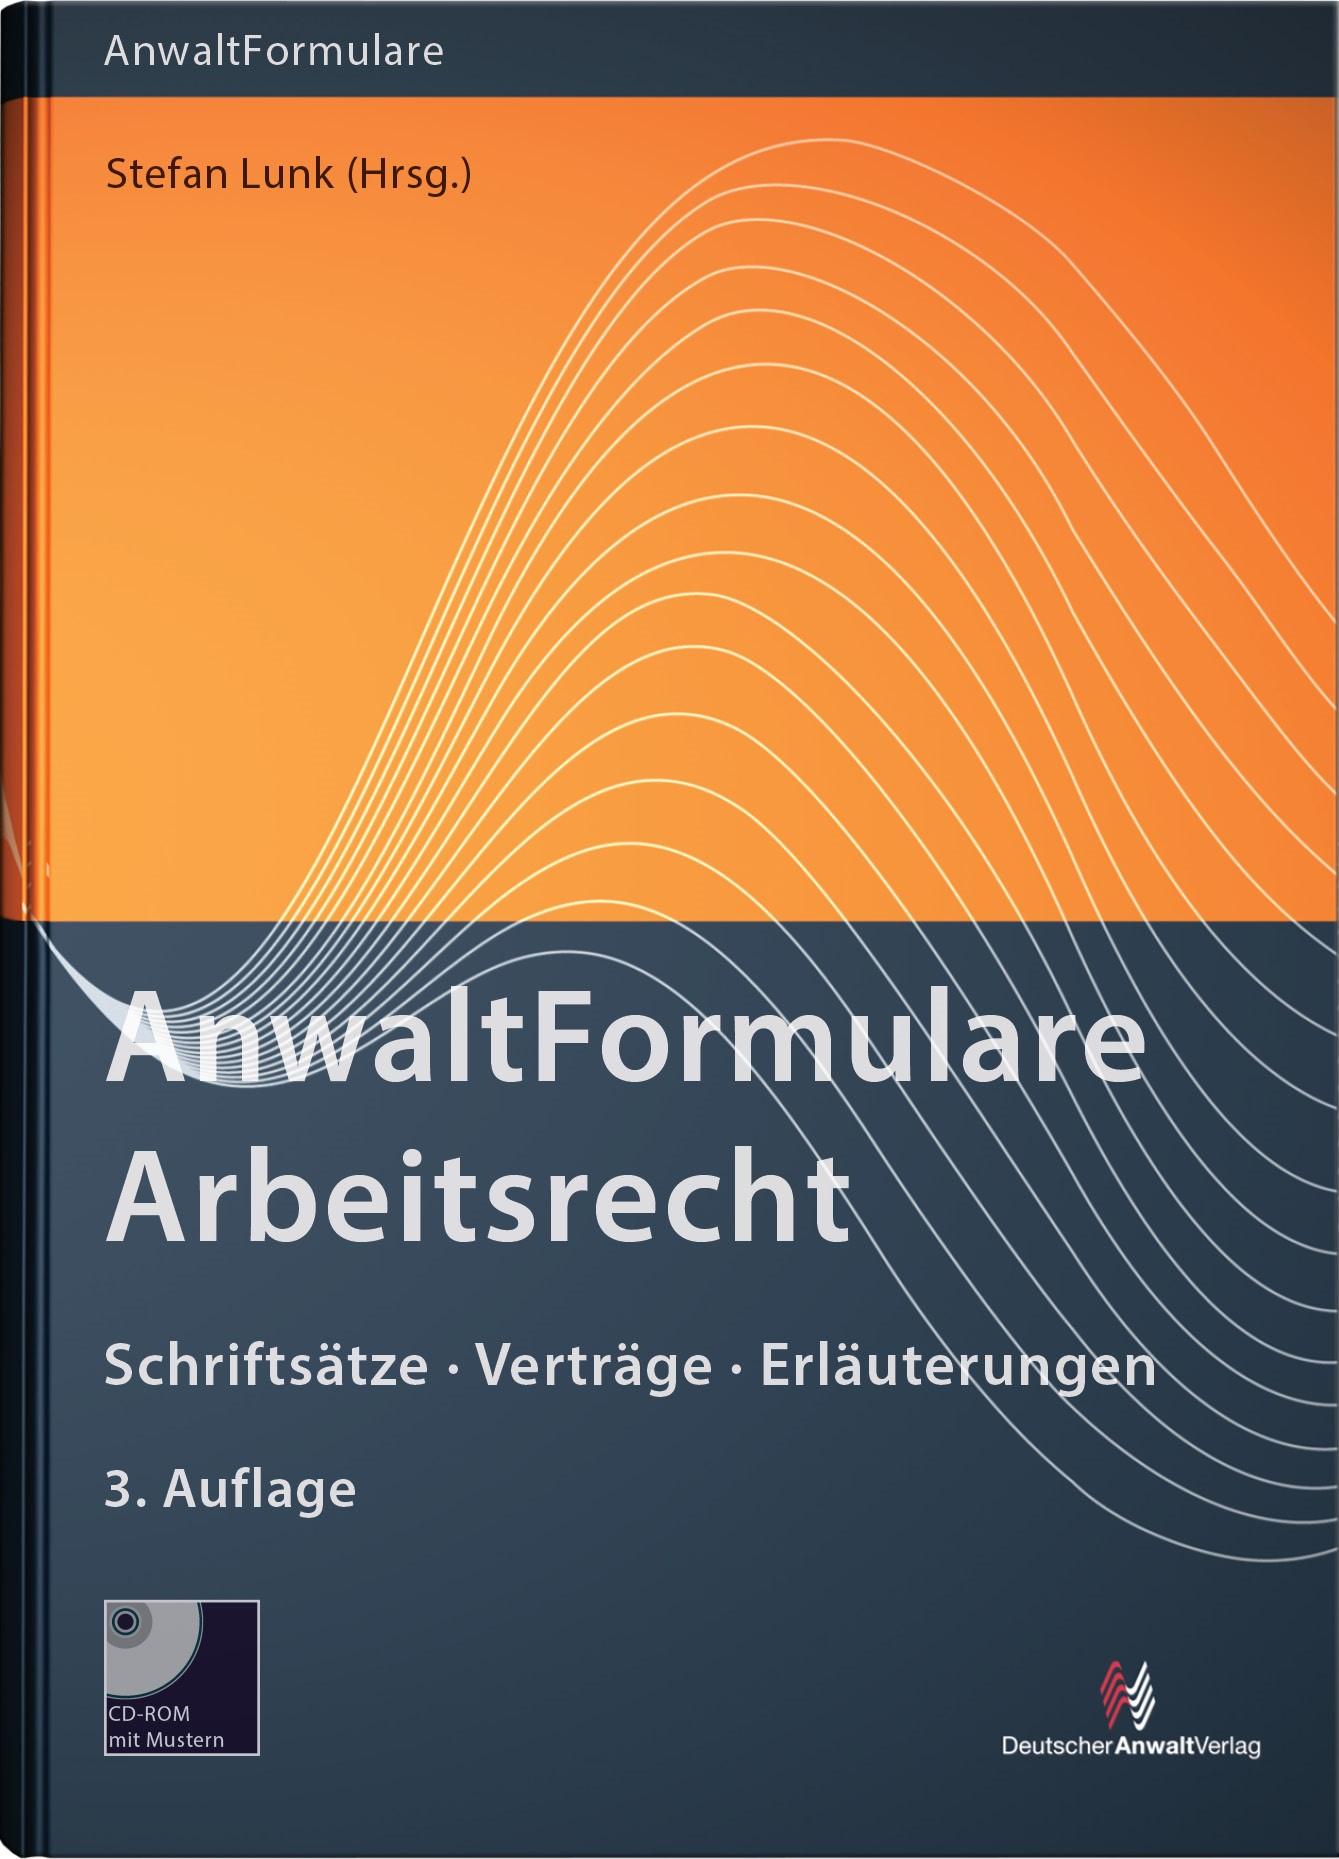 AnwaltFormulare Arbeitsrecht | Lunk (Hrsg.) | 3. Auflage, 2017 (Cover)